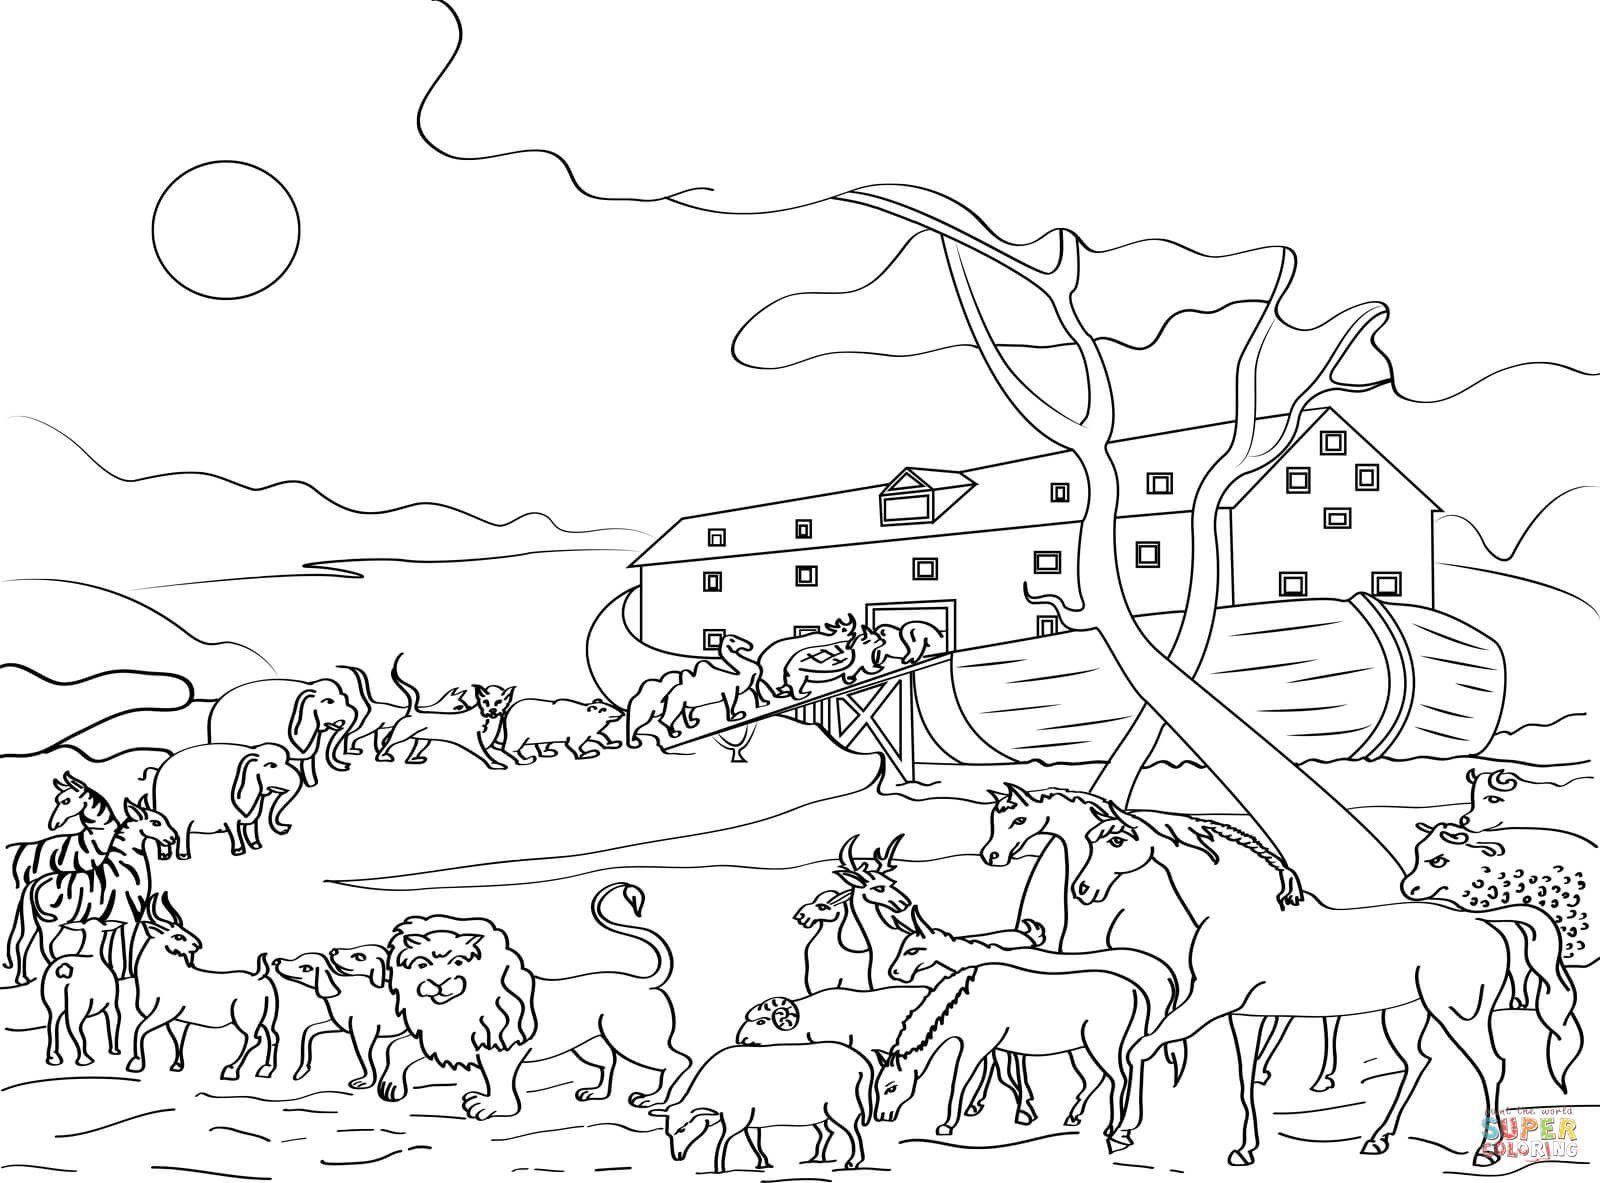 99 Neu Arche Noah Ausmalbild Stock Malvorlagen Tiere Bibel Malvorlagen Arche Noah